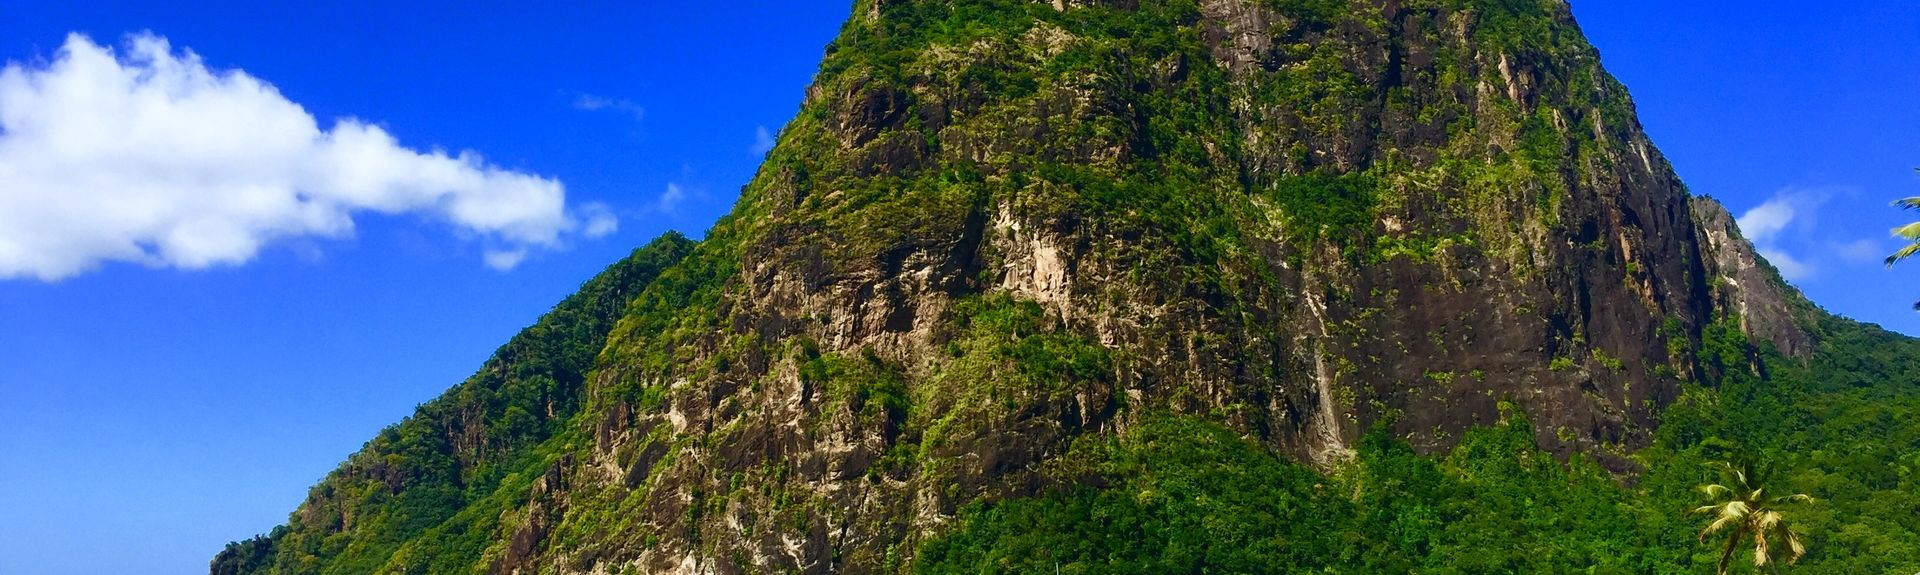 Mon Repos, Saint Lucia